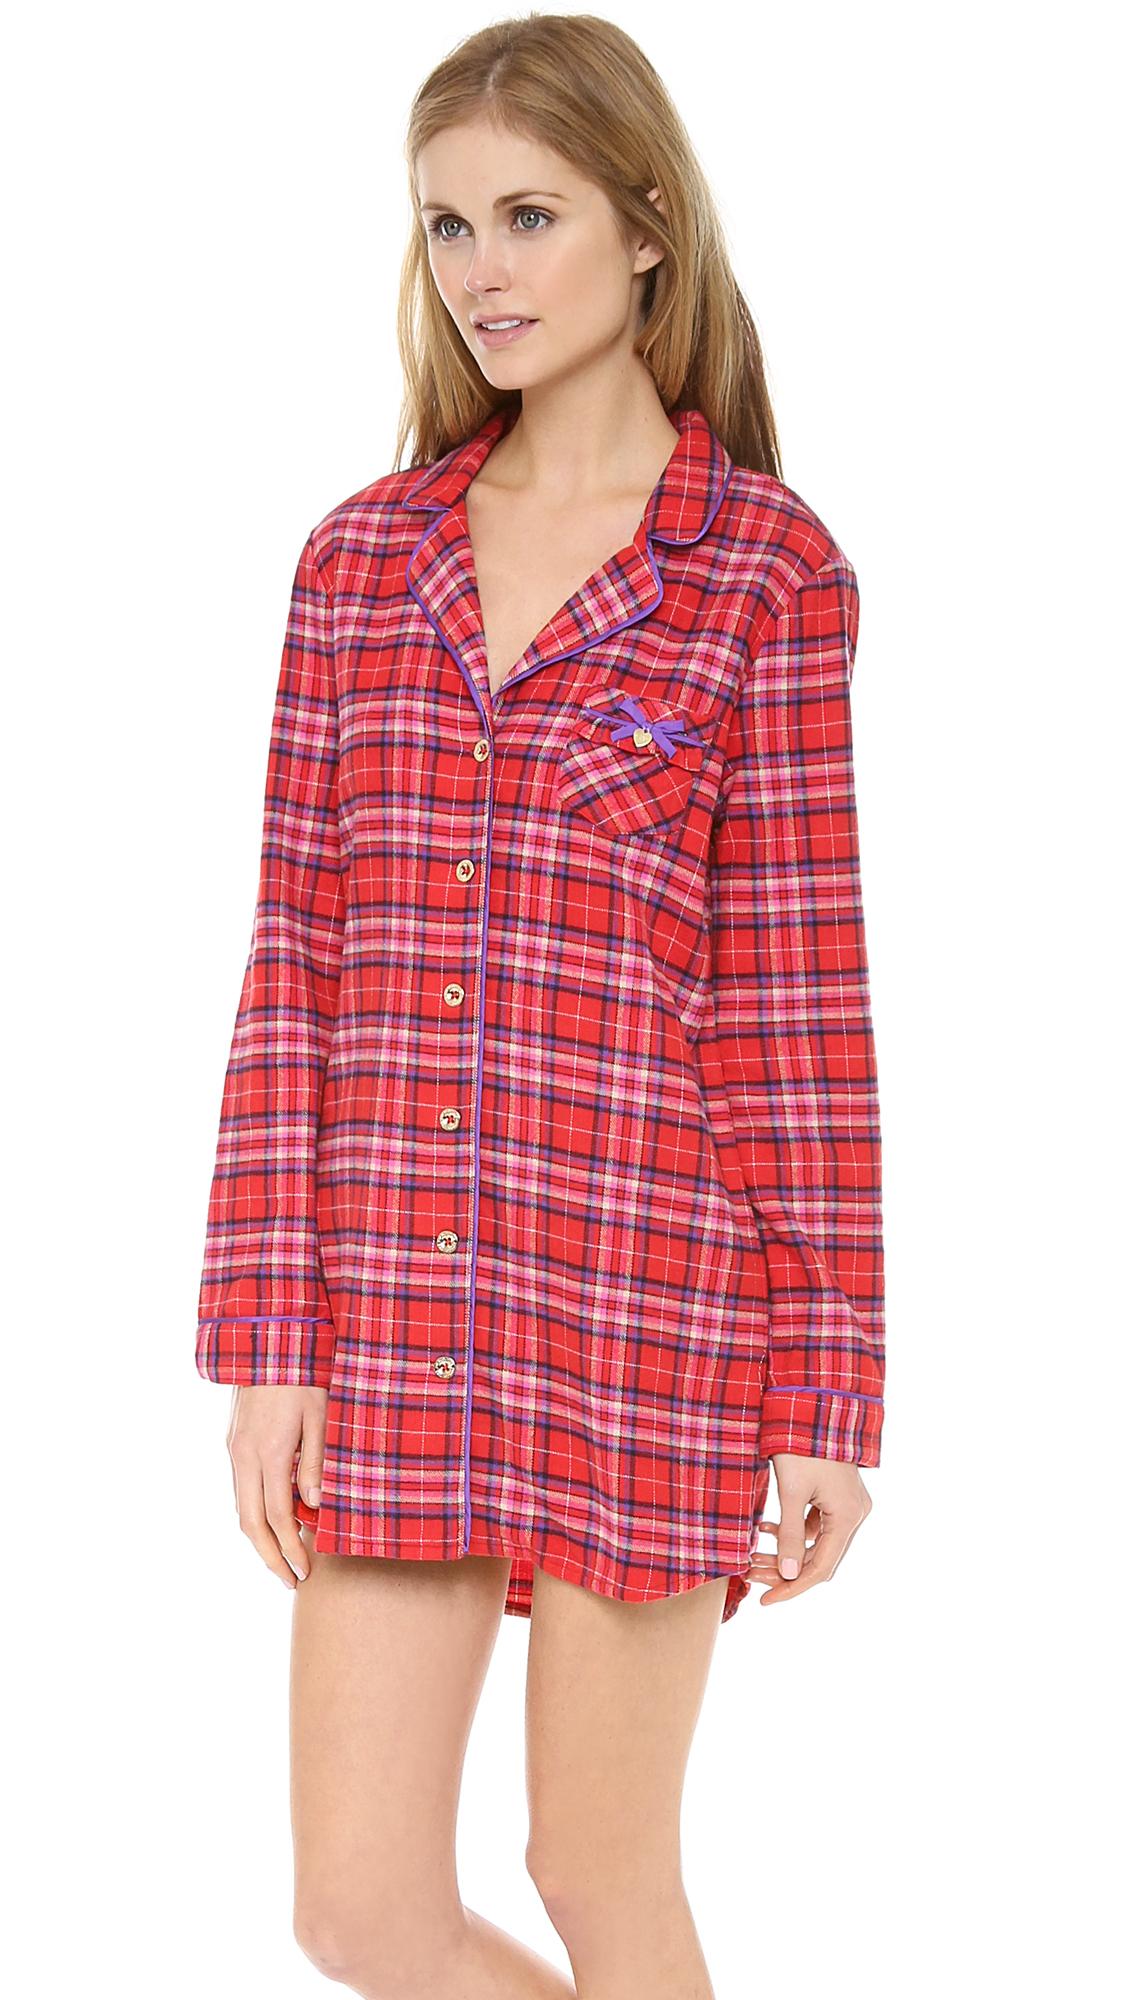 Hooded Flannel Shirt Women S